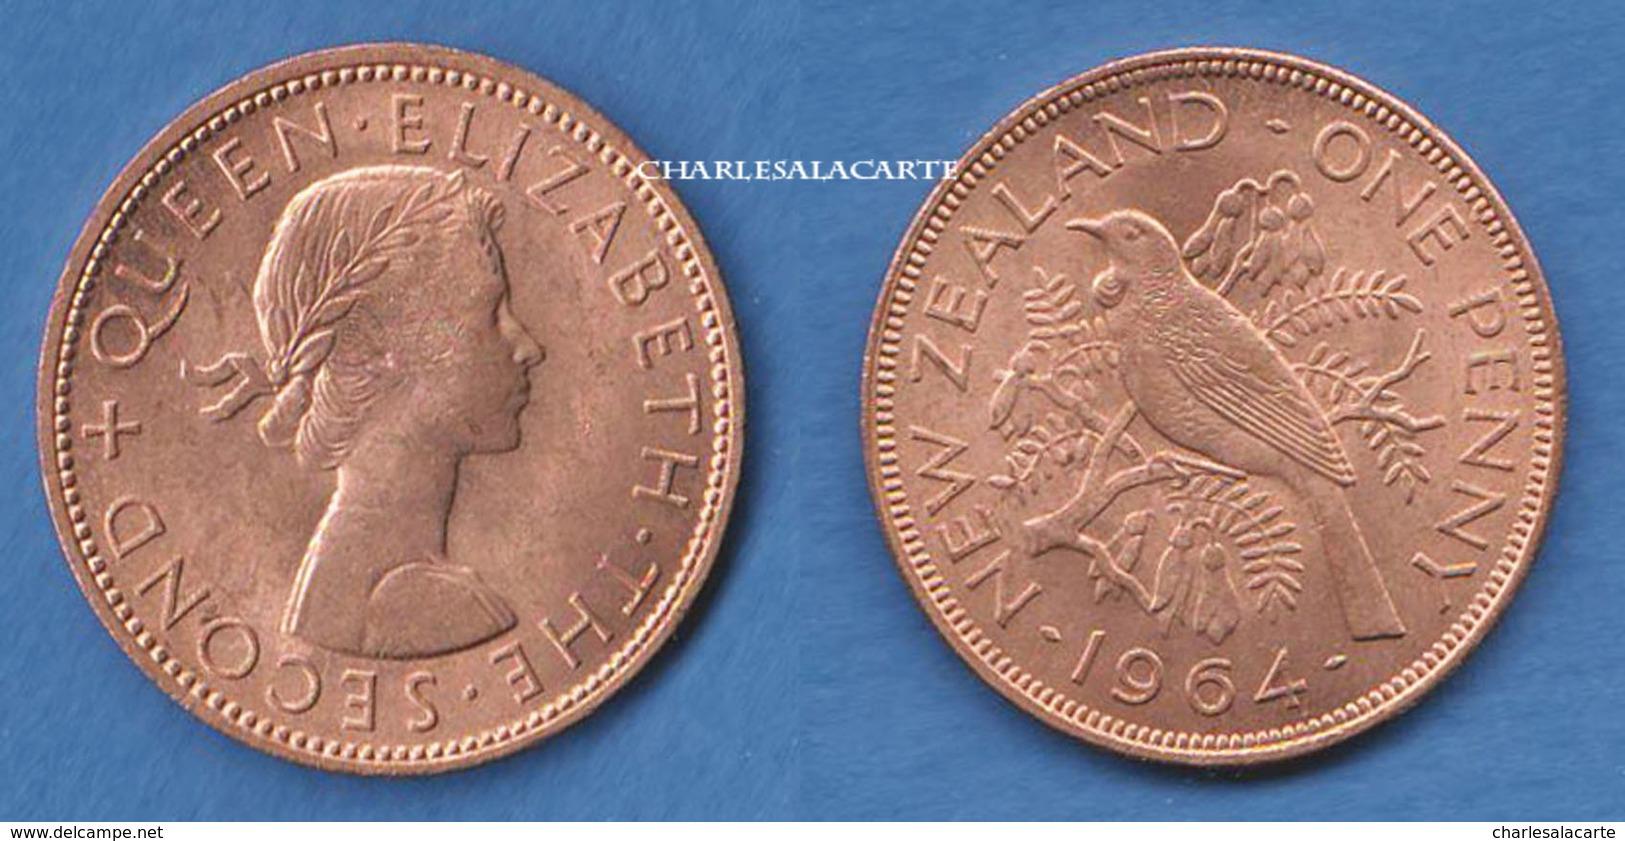 NEW ZEALAND 1964  ELIZABETH II  1d. BRONZE  QUEEN AND TUI BIRD  SUPERB CONDITION - Nouvelle-Zélande